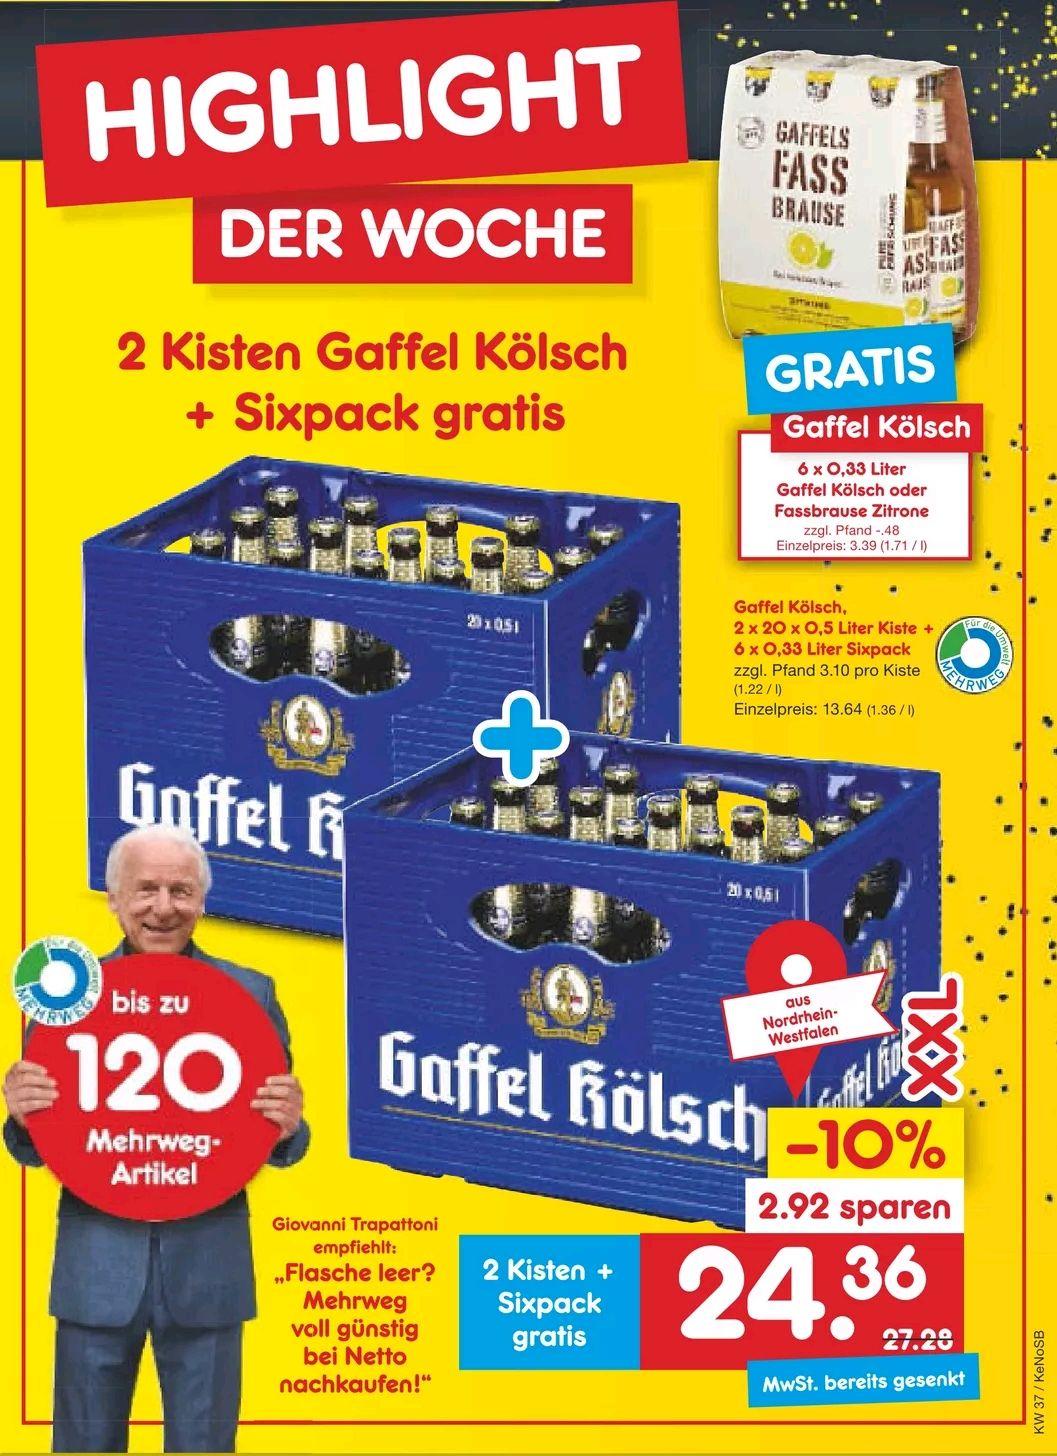 [Netto MD] Sammel-Deal 2x Bierkiste kaufen, 1x Sixpack gratis (lokale Unterschiede)